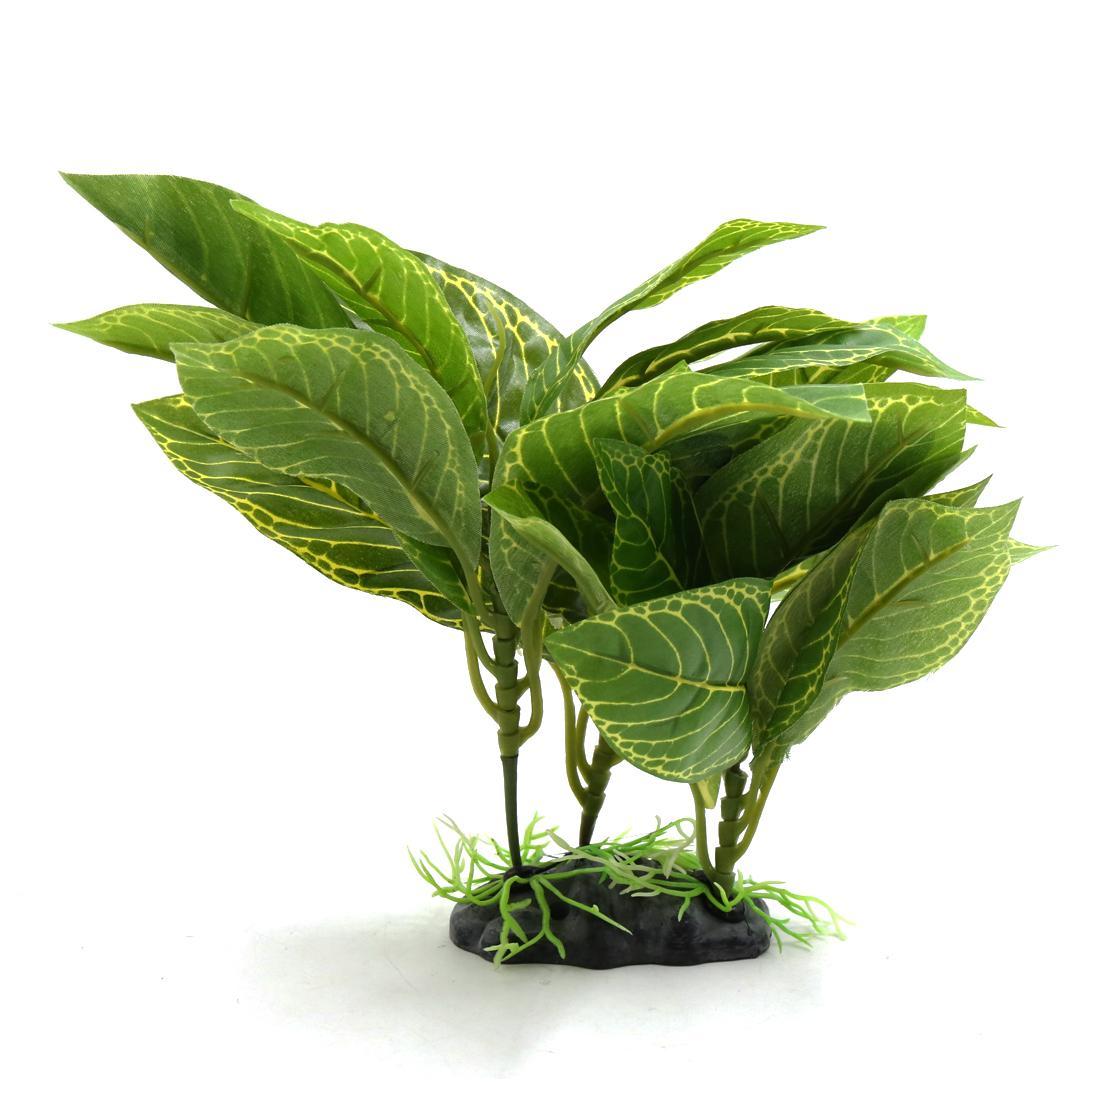 Plastic Terrarium Lifelike Plant Decor Ornament for Reptiles and Amphibians